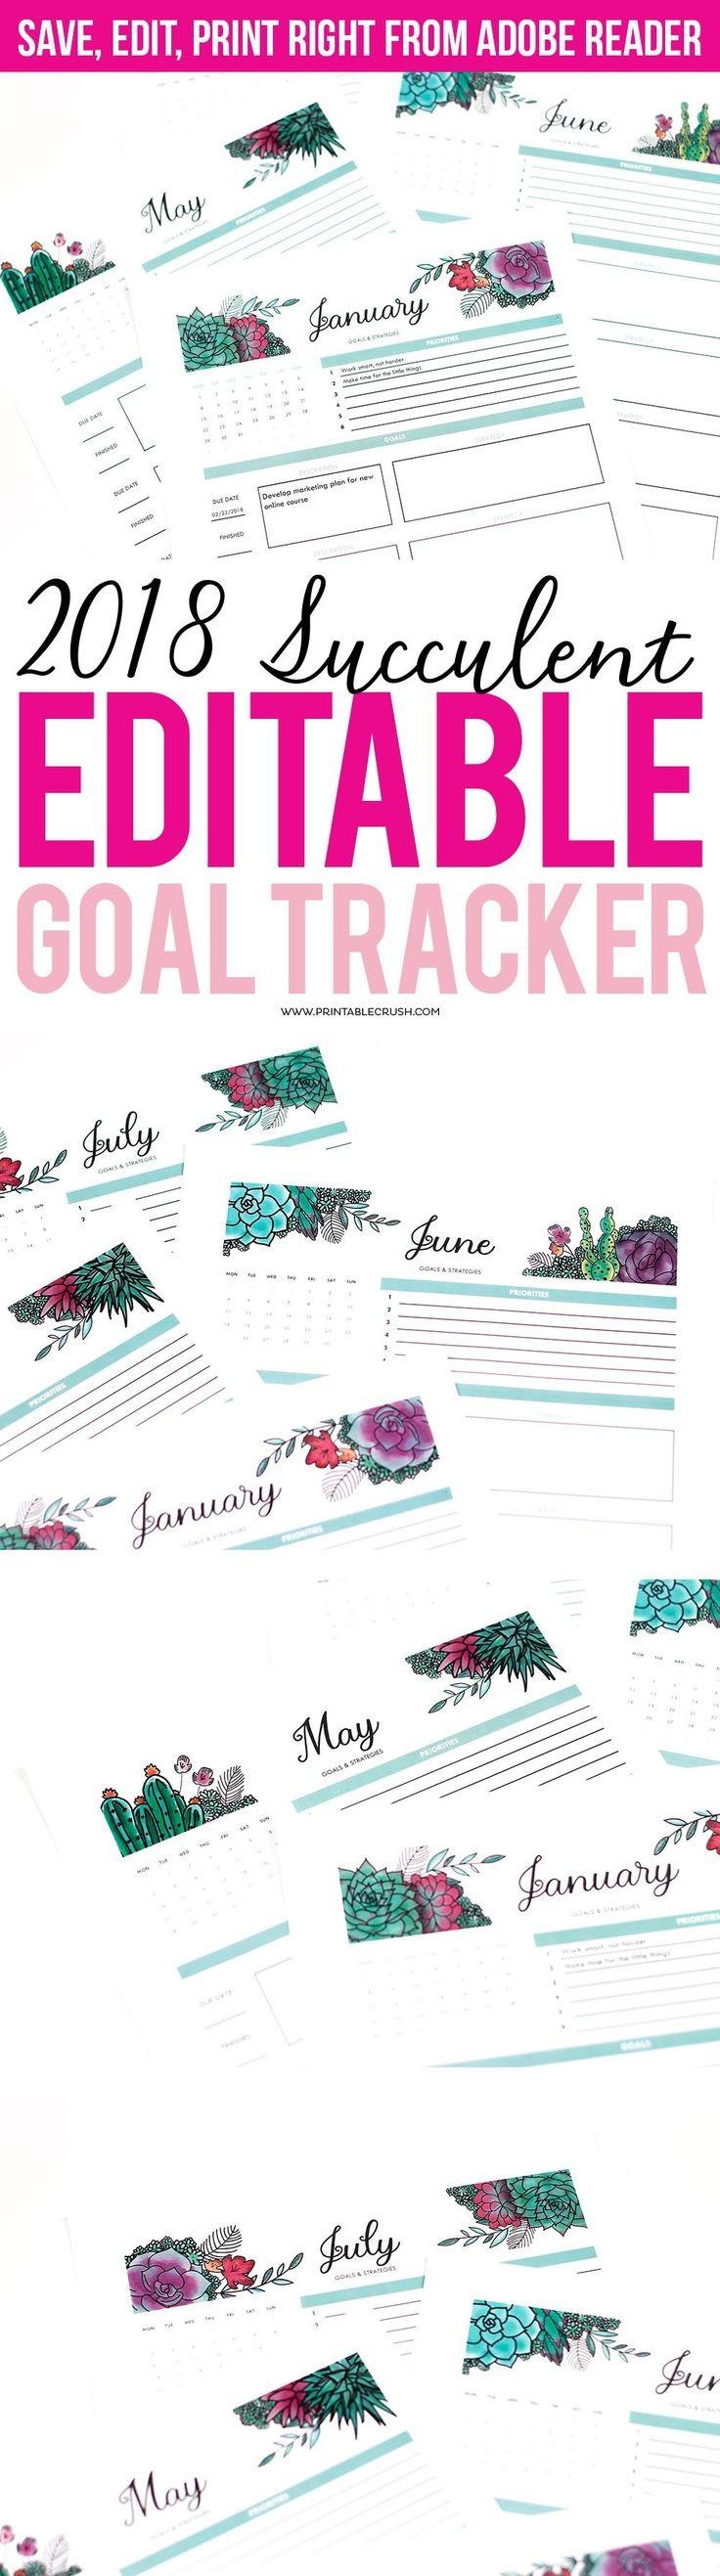 Succulents Editable 2018 Goal Tracker Printable